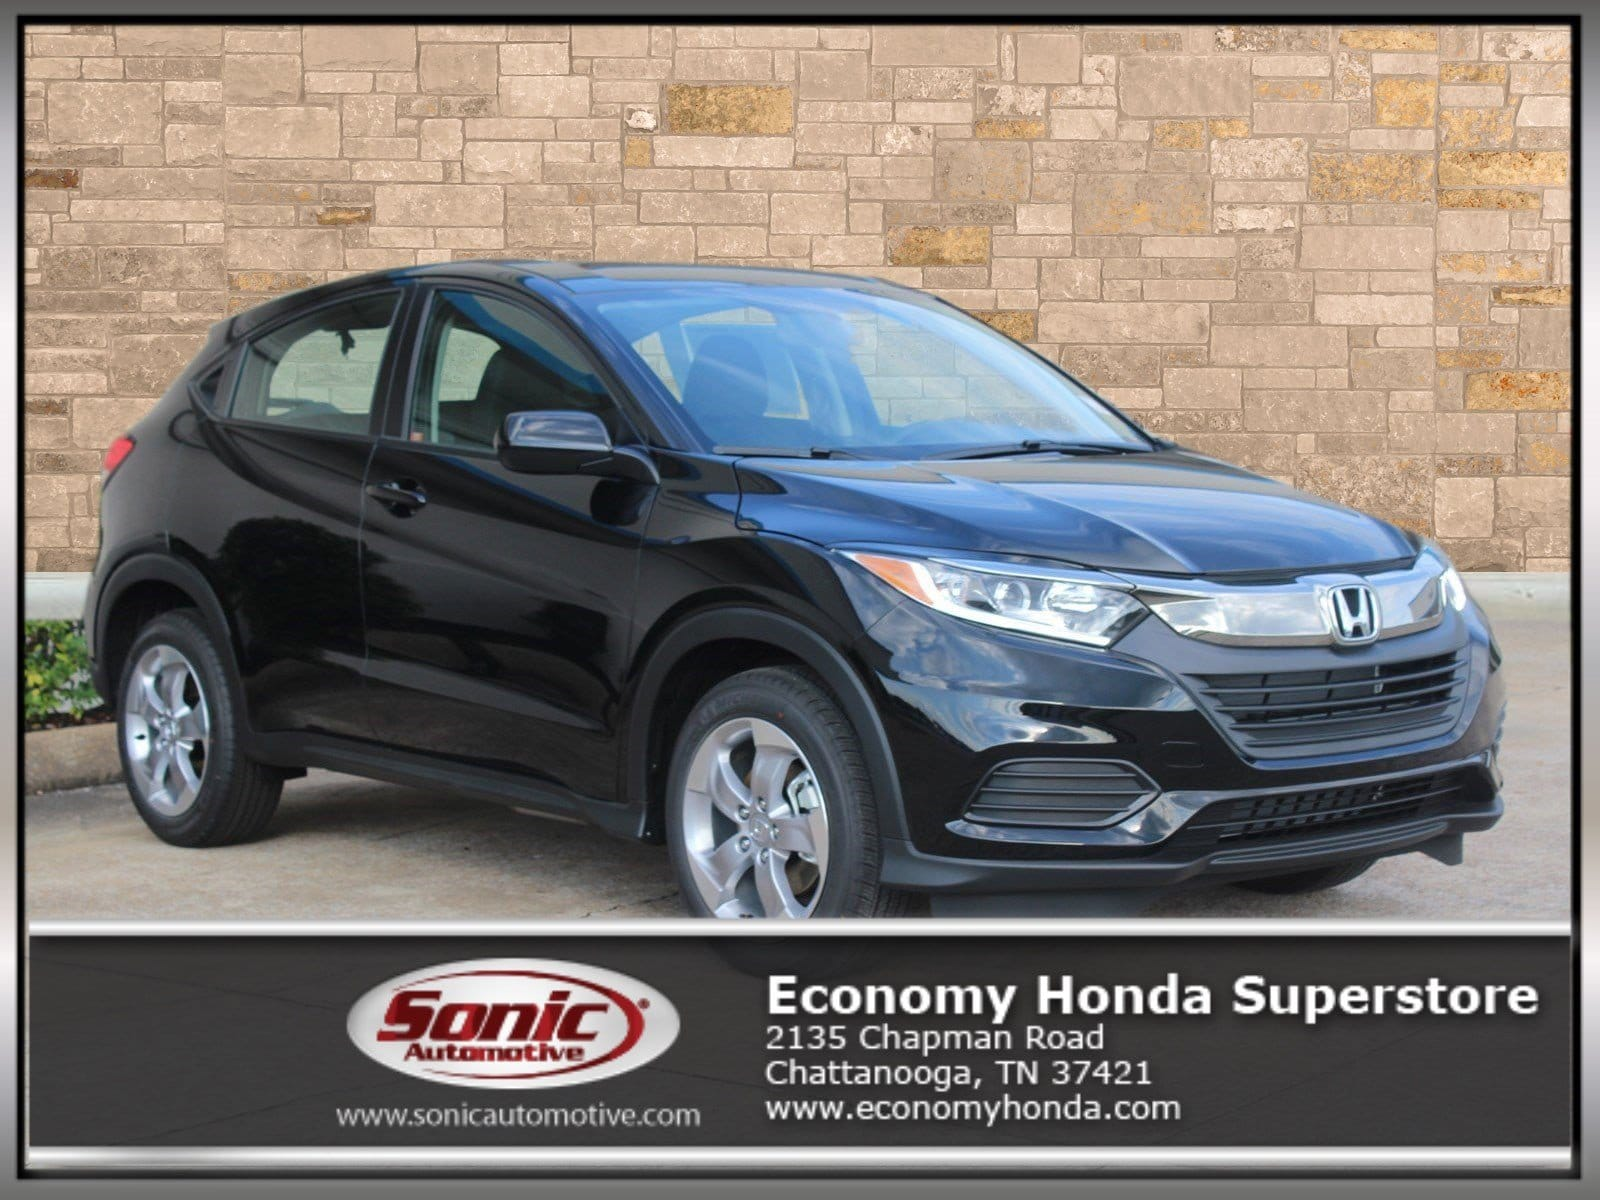 Honda Hr V In Chattanooga Tn Economy Honda Superstore